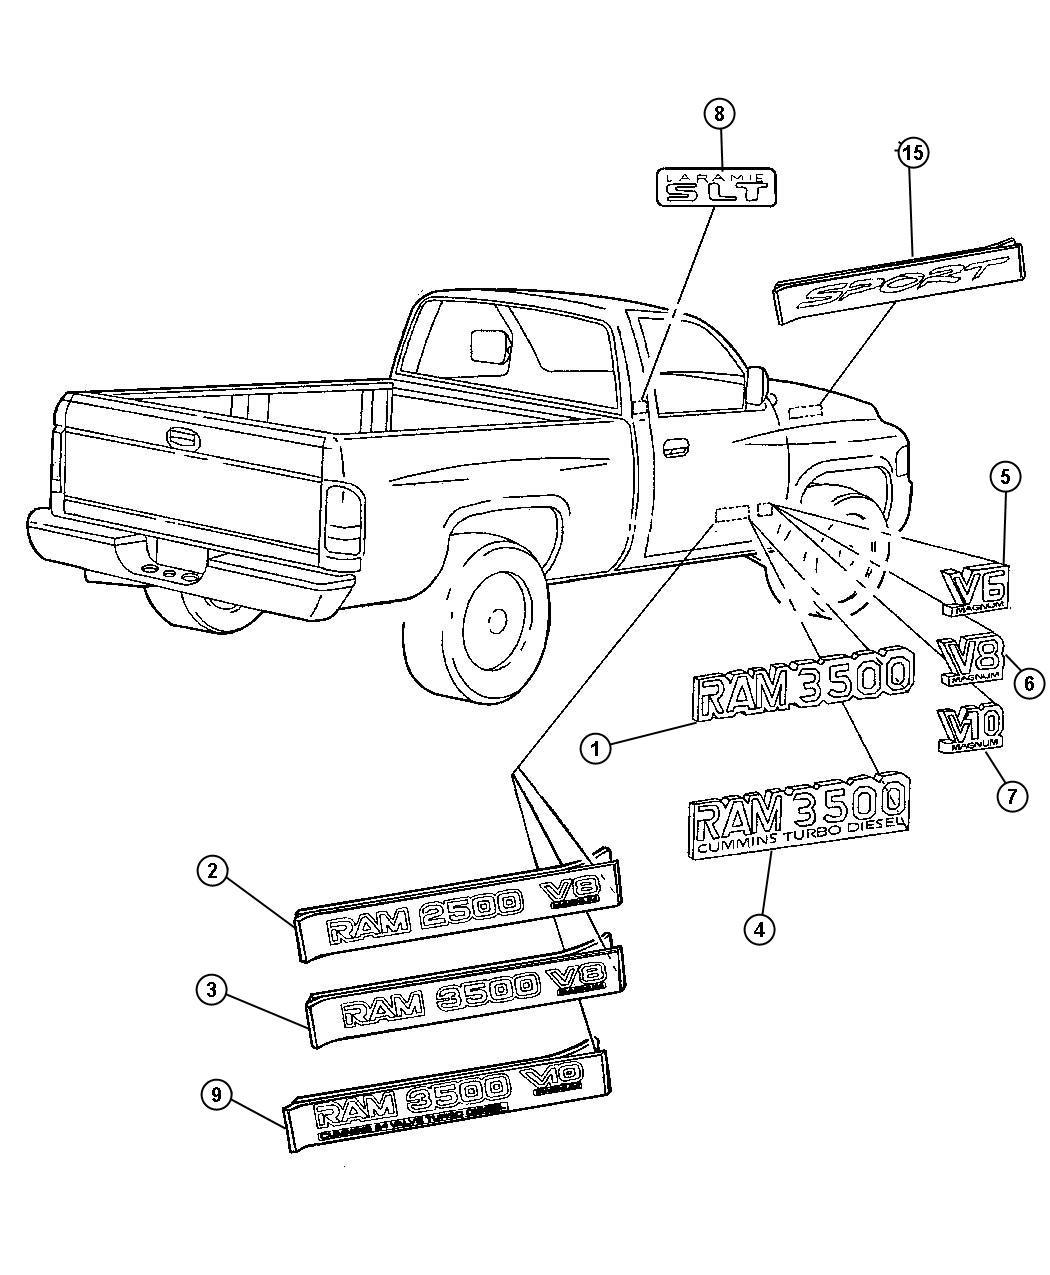 2000 Dodge Ram 2500 Nameplate  Front Fender  Ram 3500